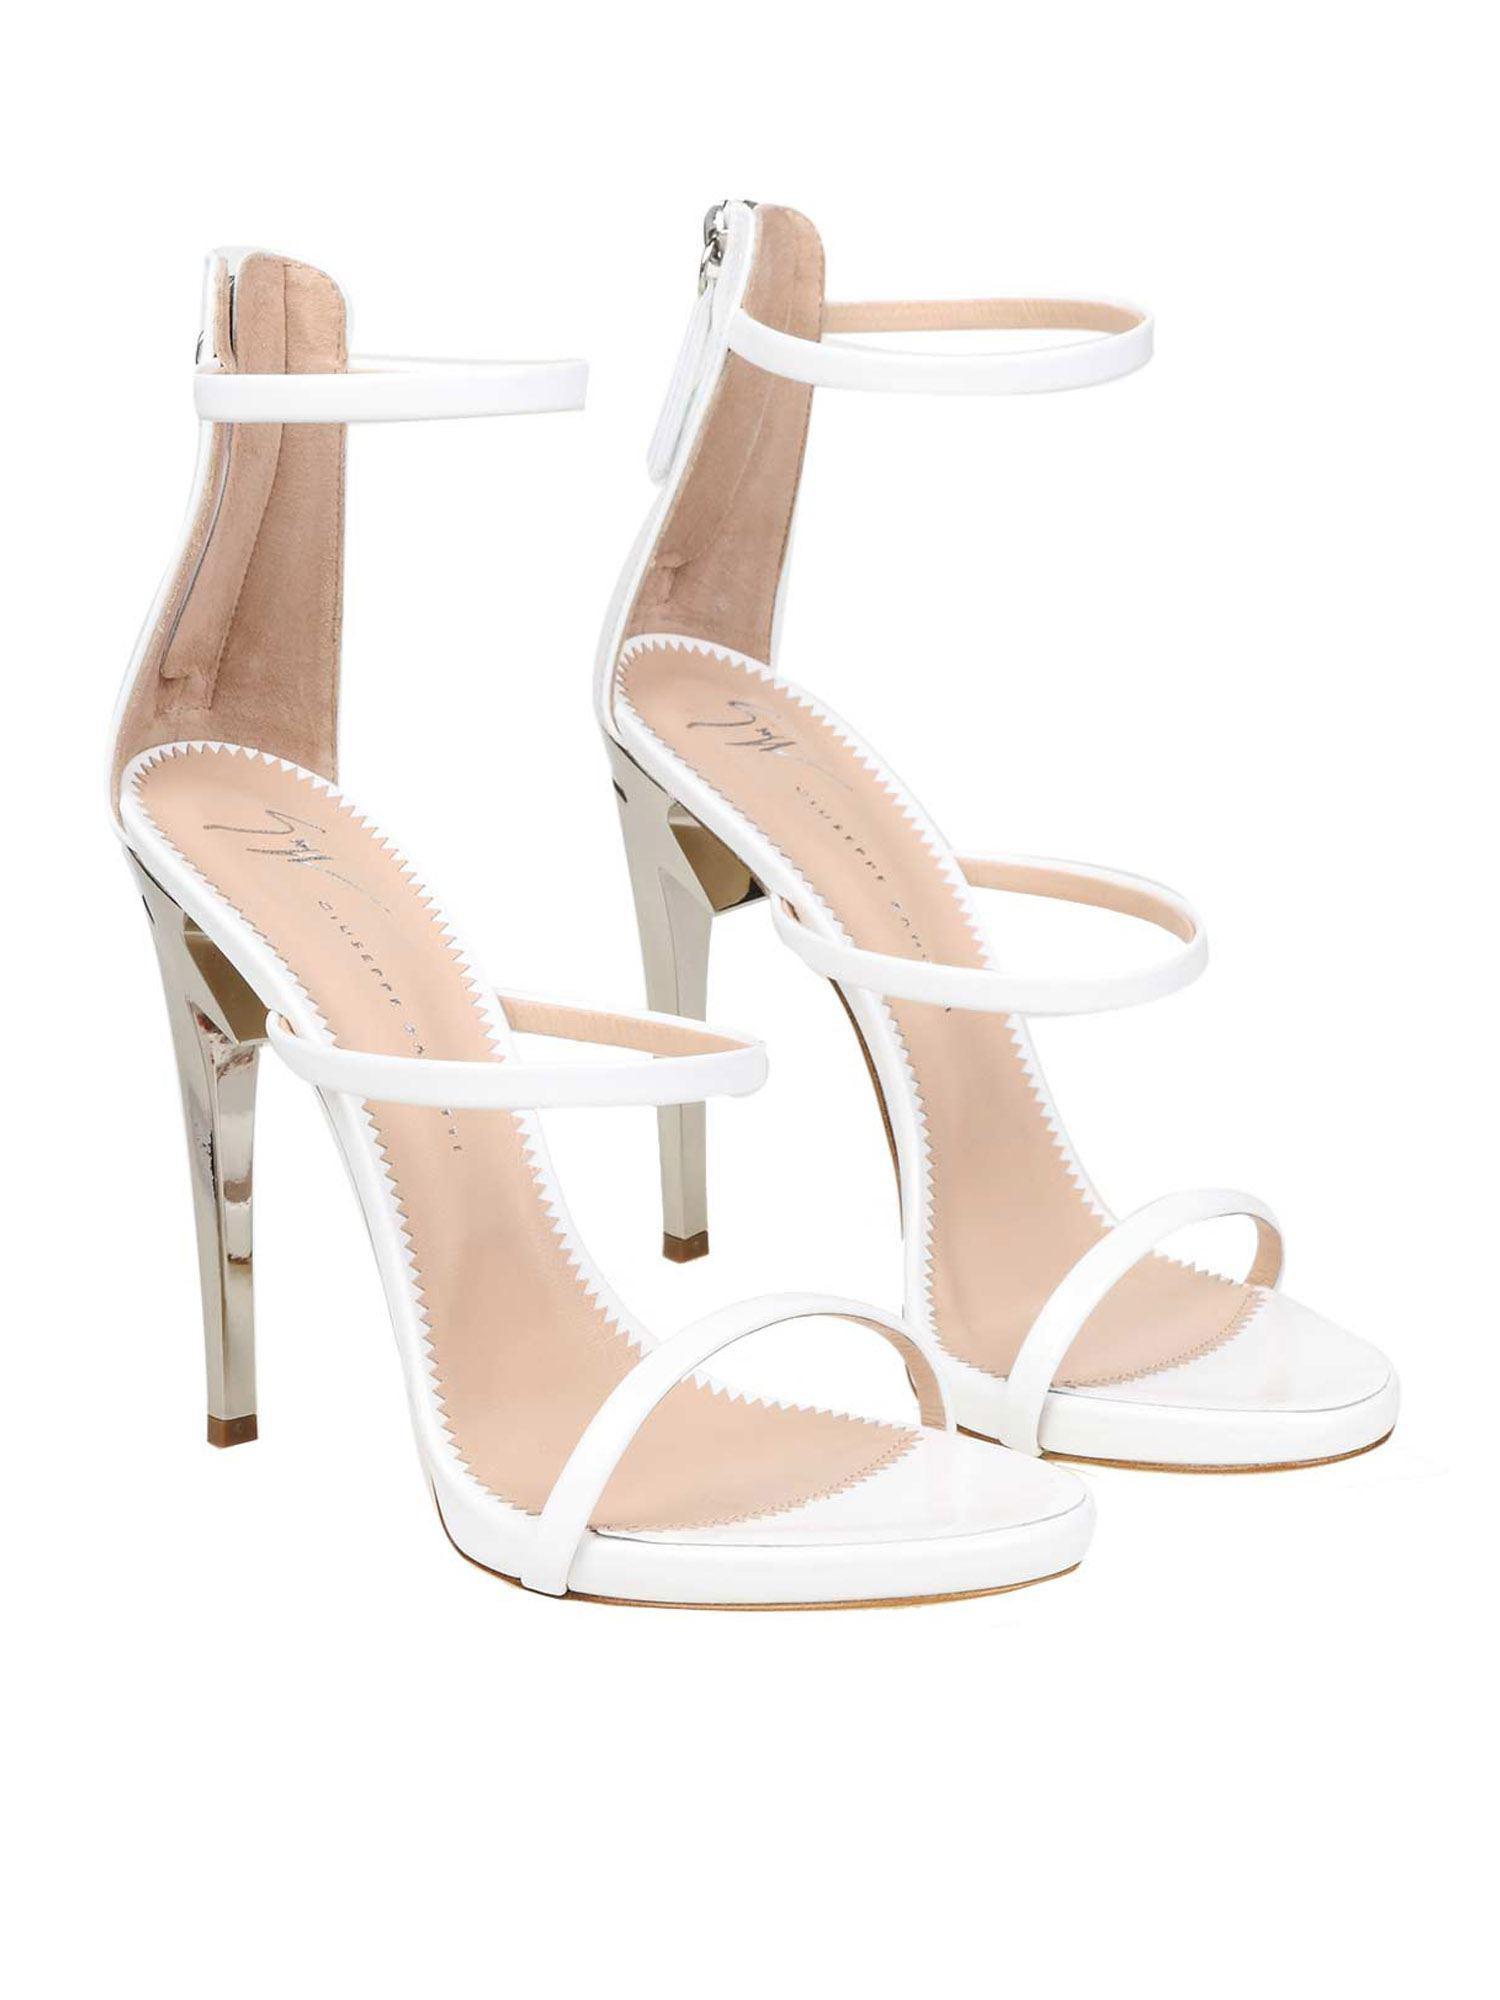 febaa3bfccba Lyst - Giuseppe Zanotti White Leather Sandals in White - Save 29%